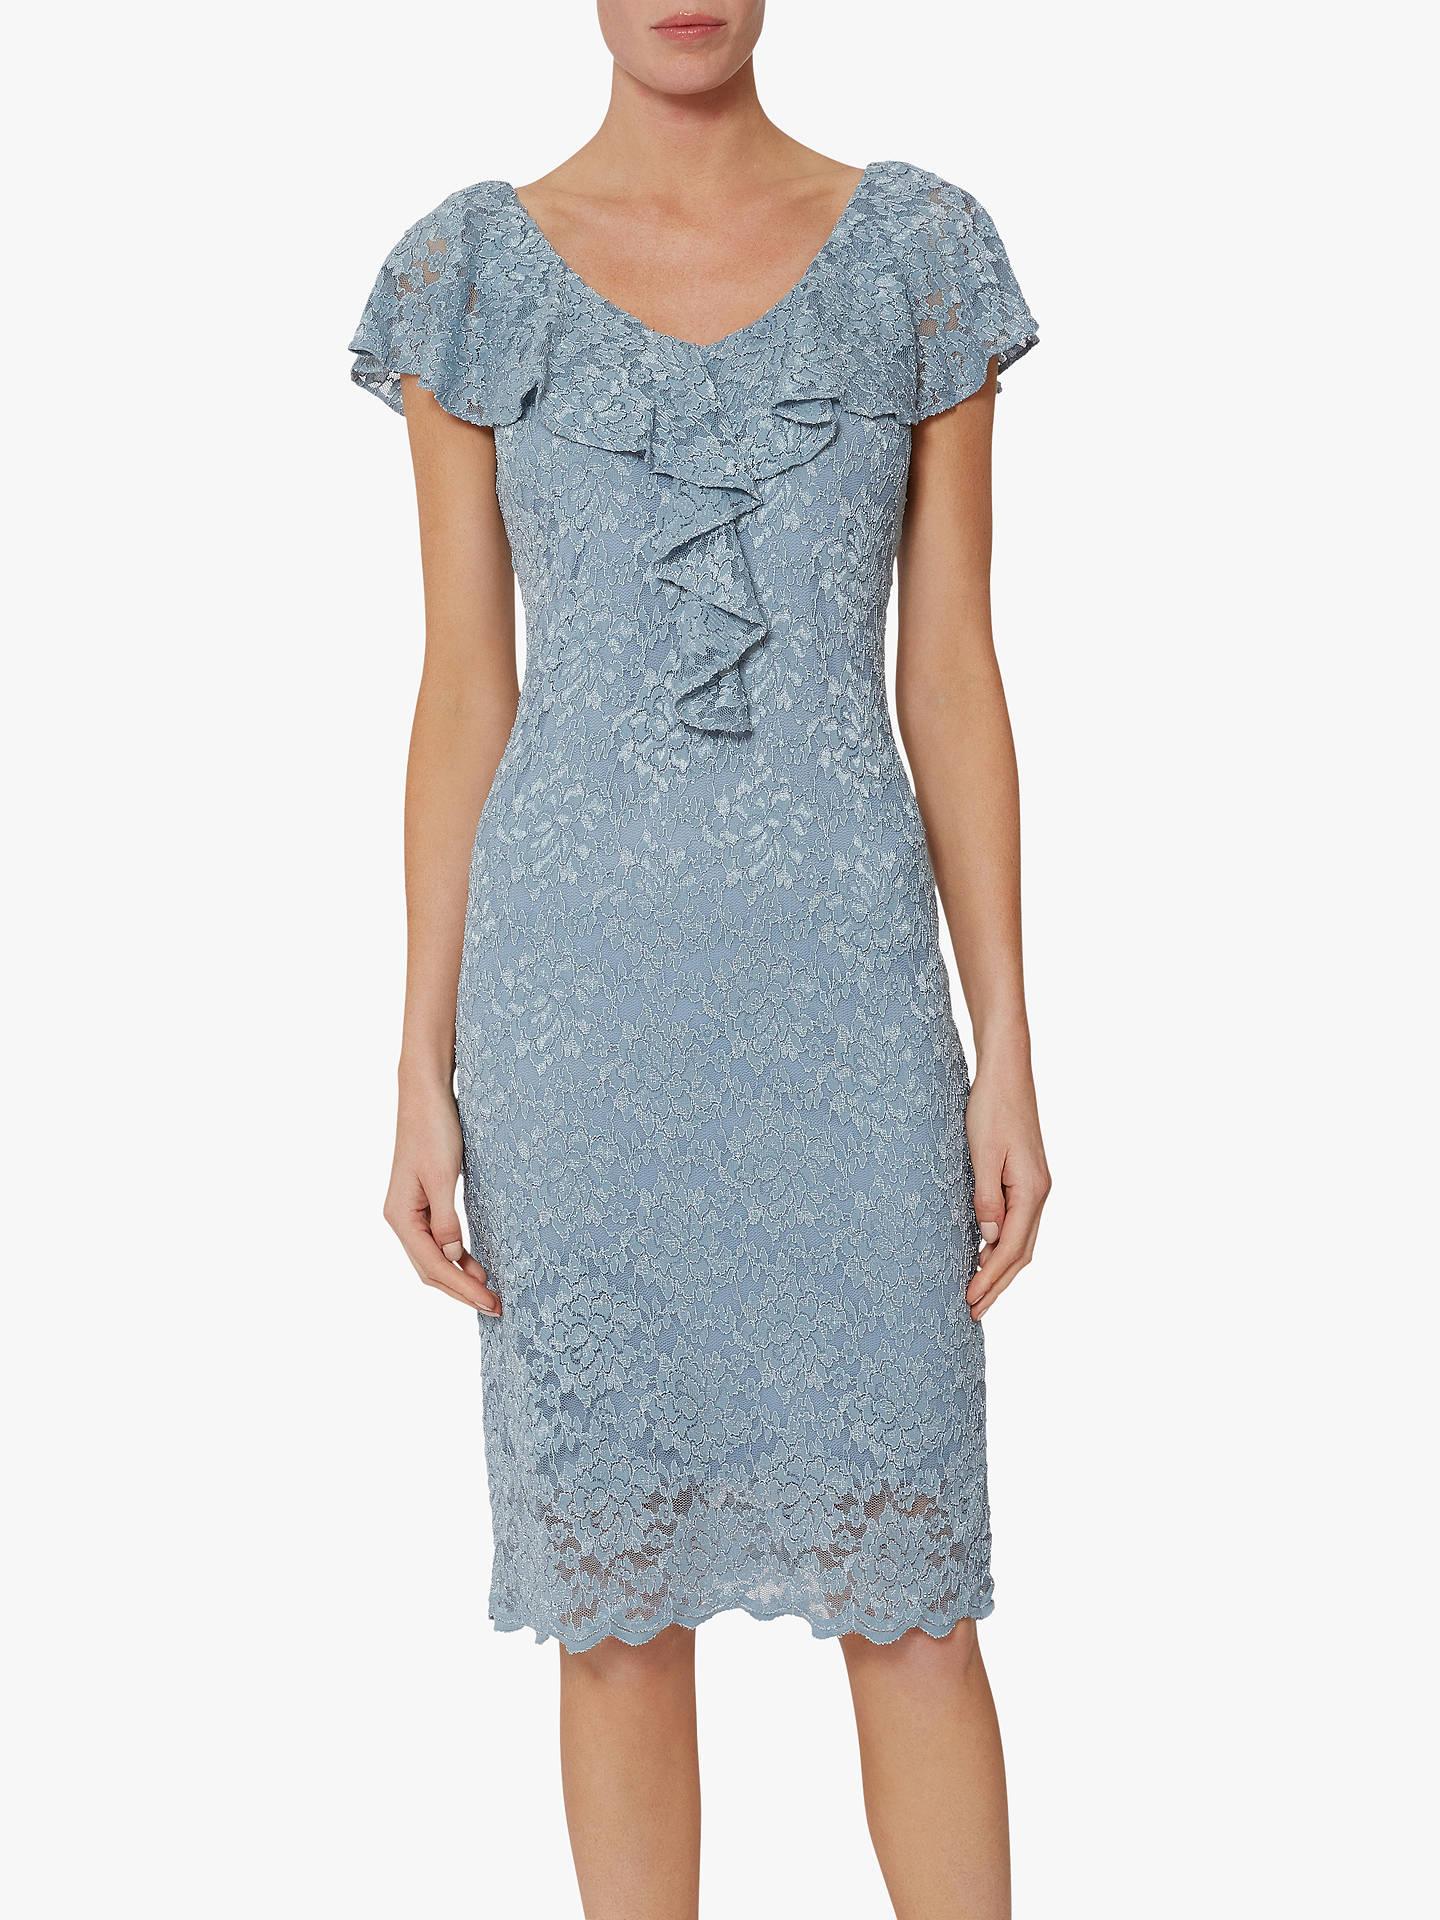 cc1f3e2db36 Gina Bacconi Starla Ruffle Lace Embroidered Dress at John Lewis ...